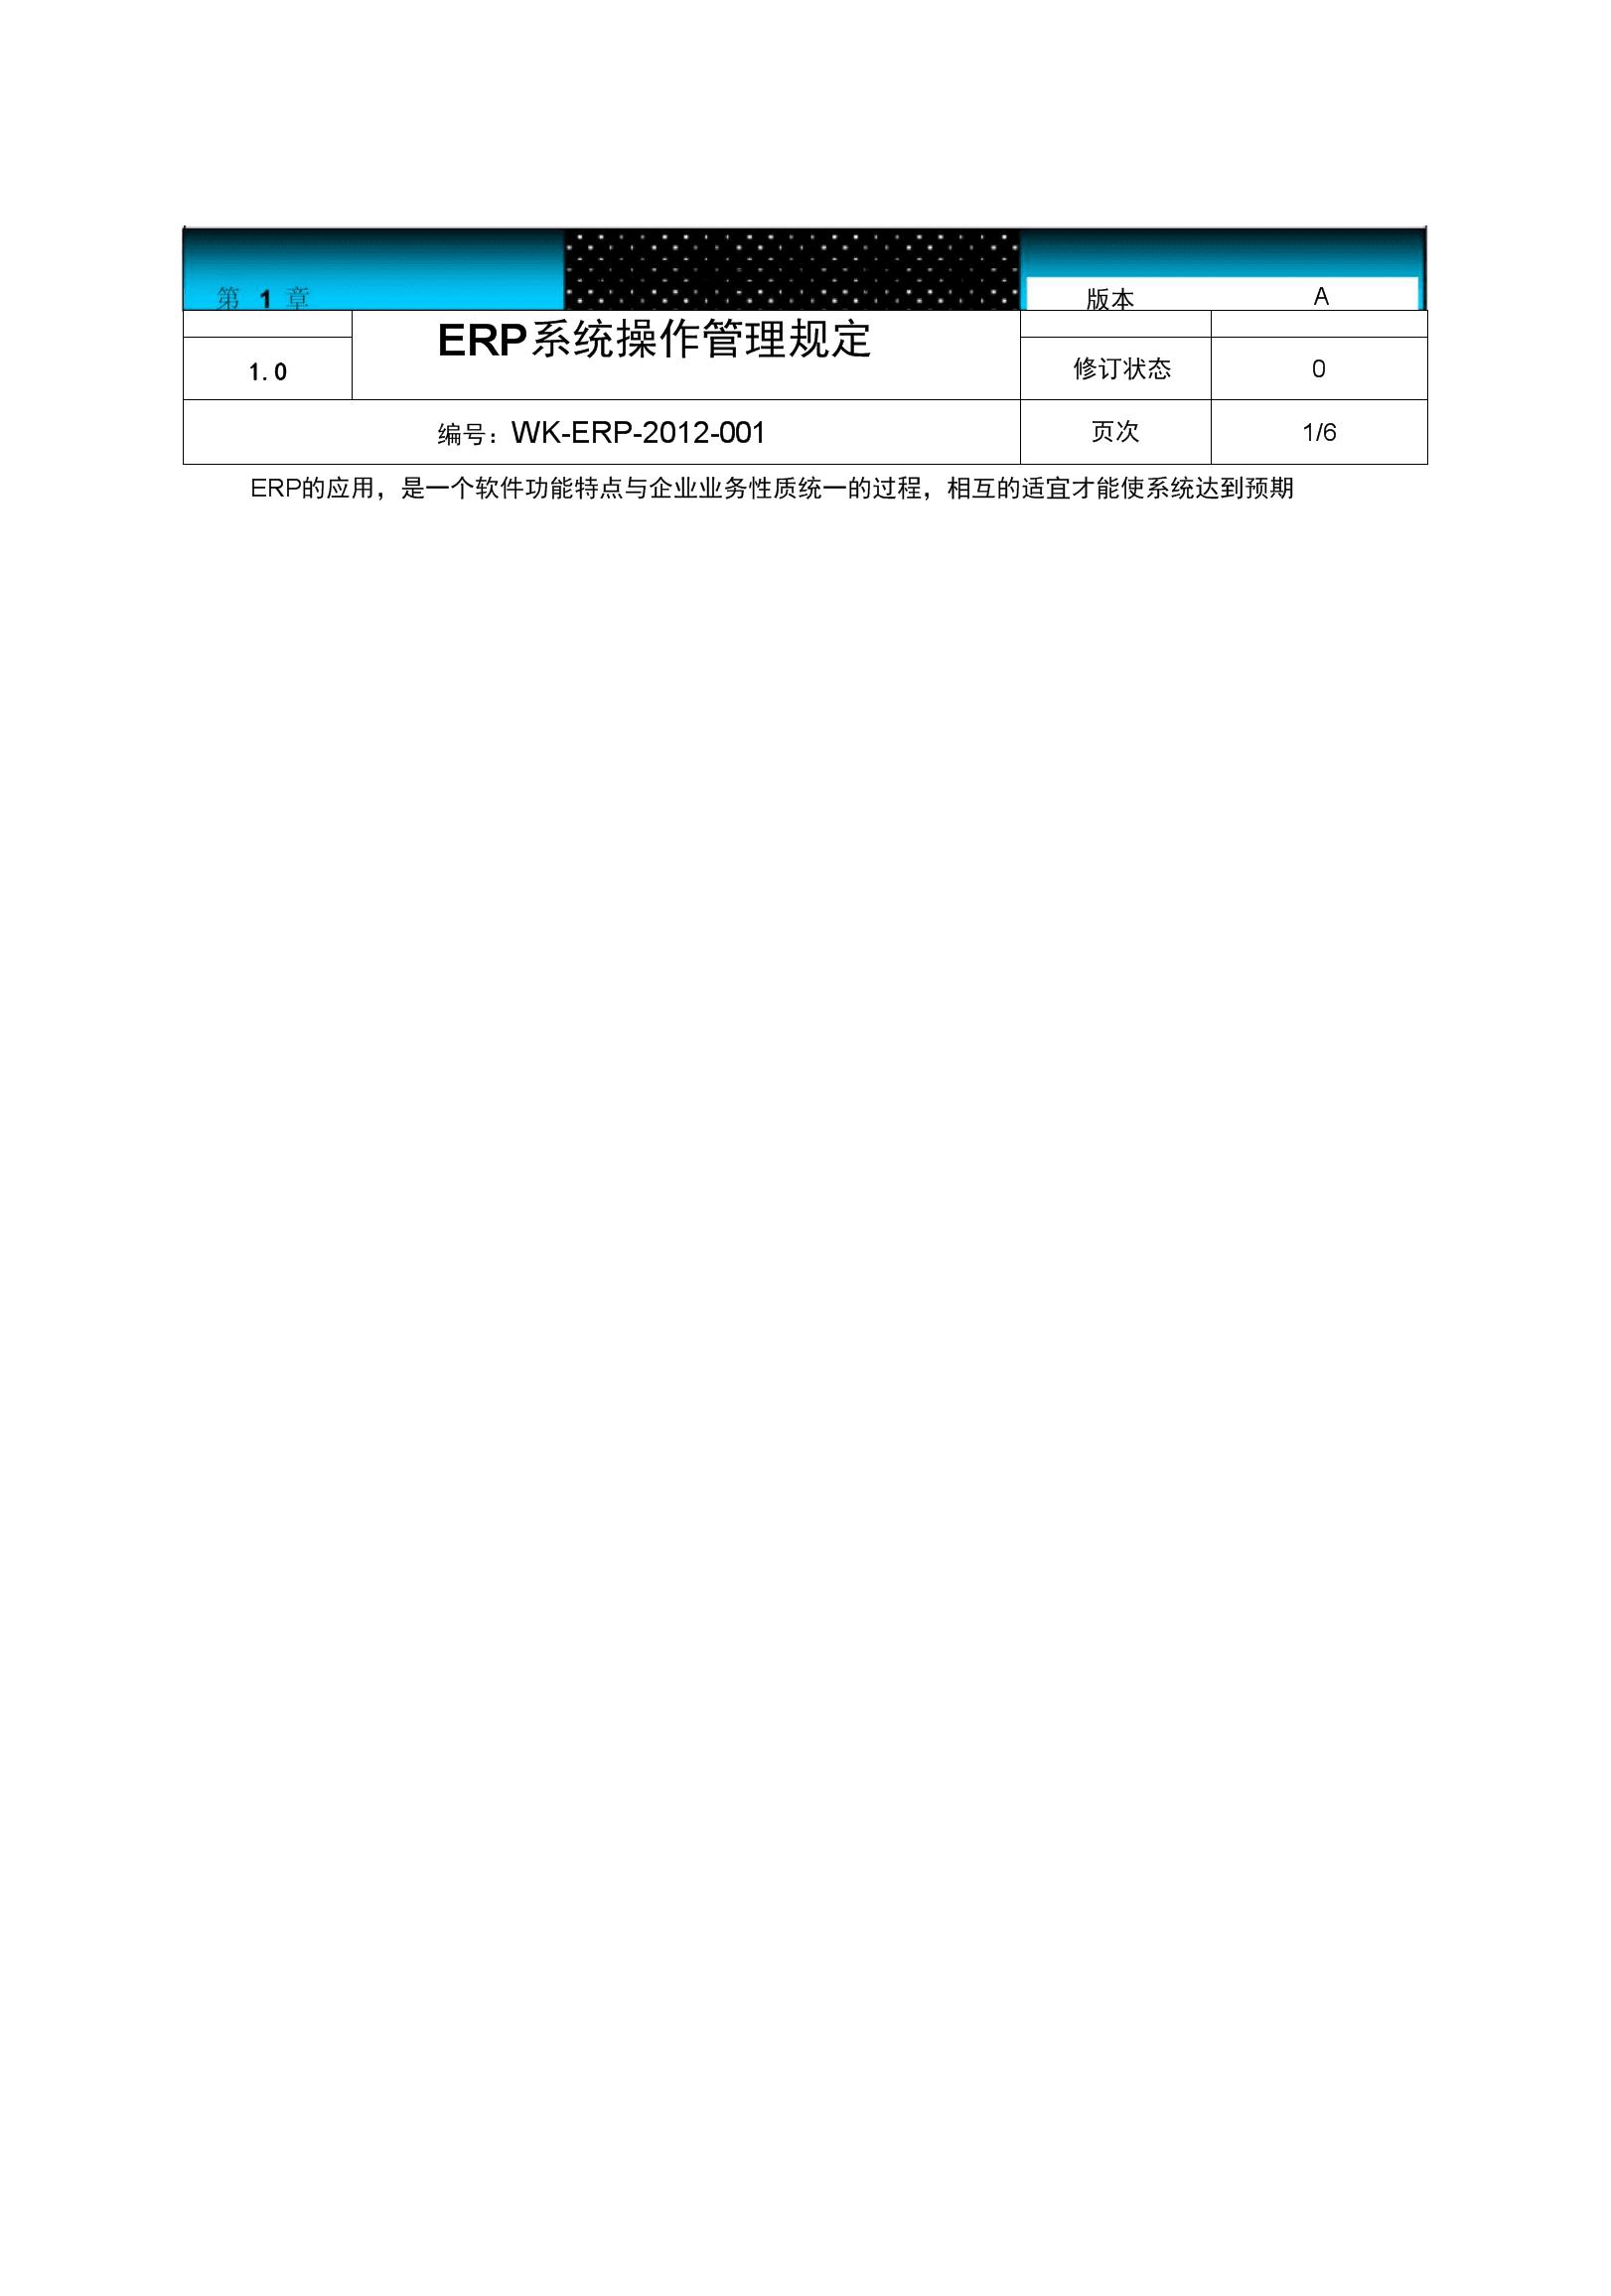 ERP系统操作管理规定.docx